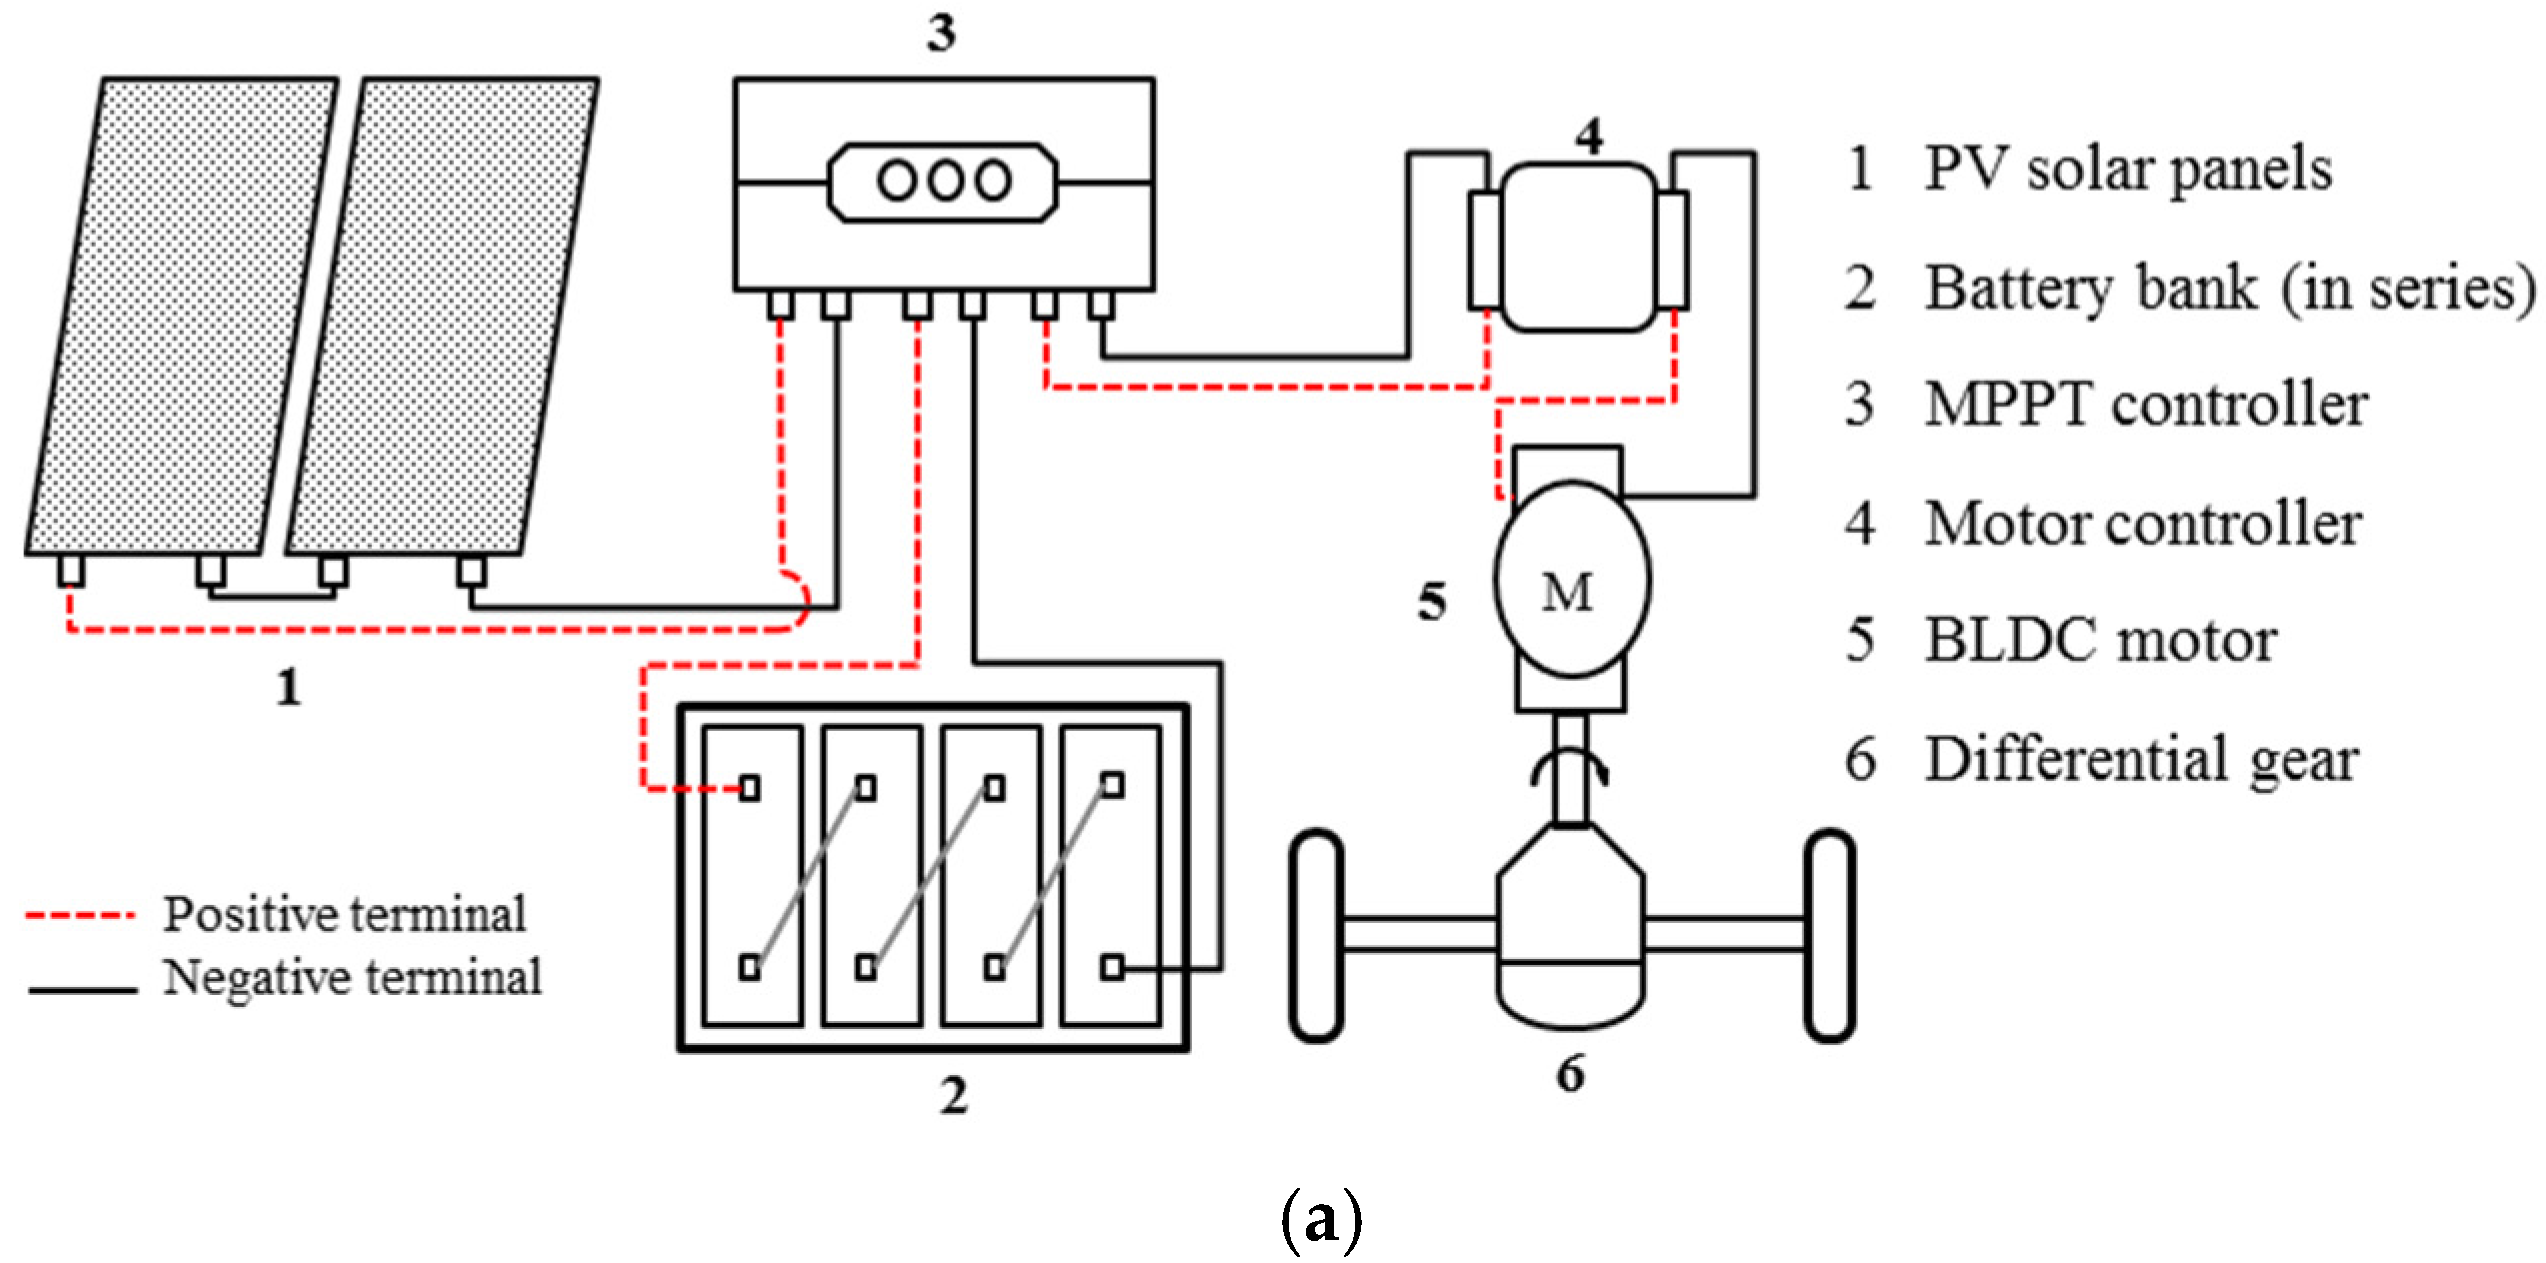 Auto Rickshaw Diagram Wiring Diagrams Energies Free Full Text Techno Economic Investigation Of Solar